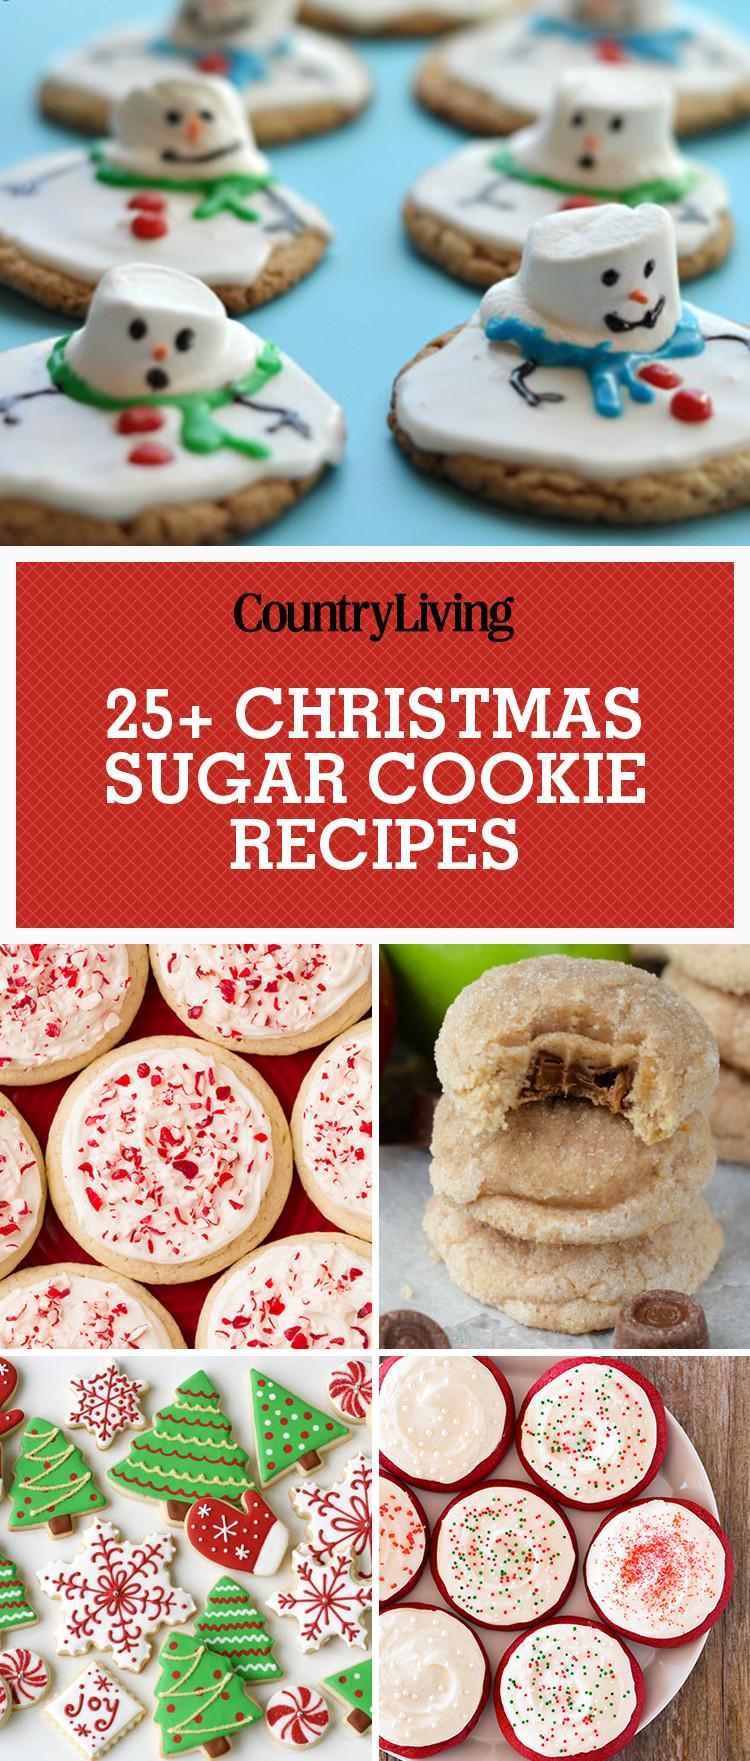 Easy Christmas Sugar Cookies  25 Easy Christmas Sugar Cookies Recipes & Decorating